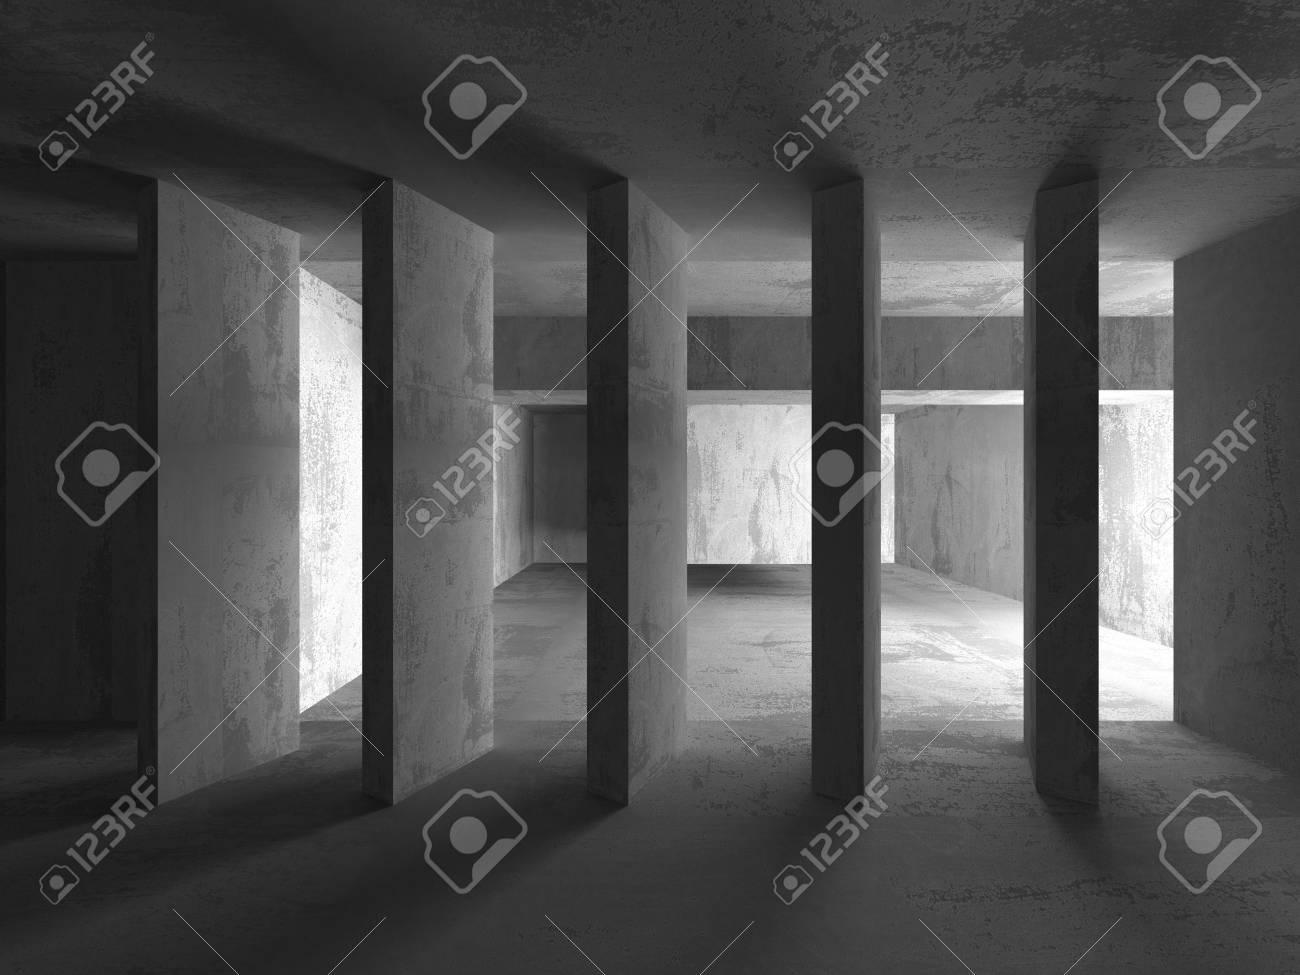 Fondo De Arquitectura Concreta. Resumen Cuarto Oscuro Vacío ...